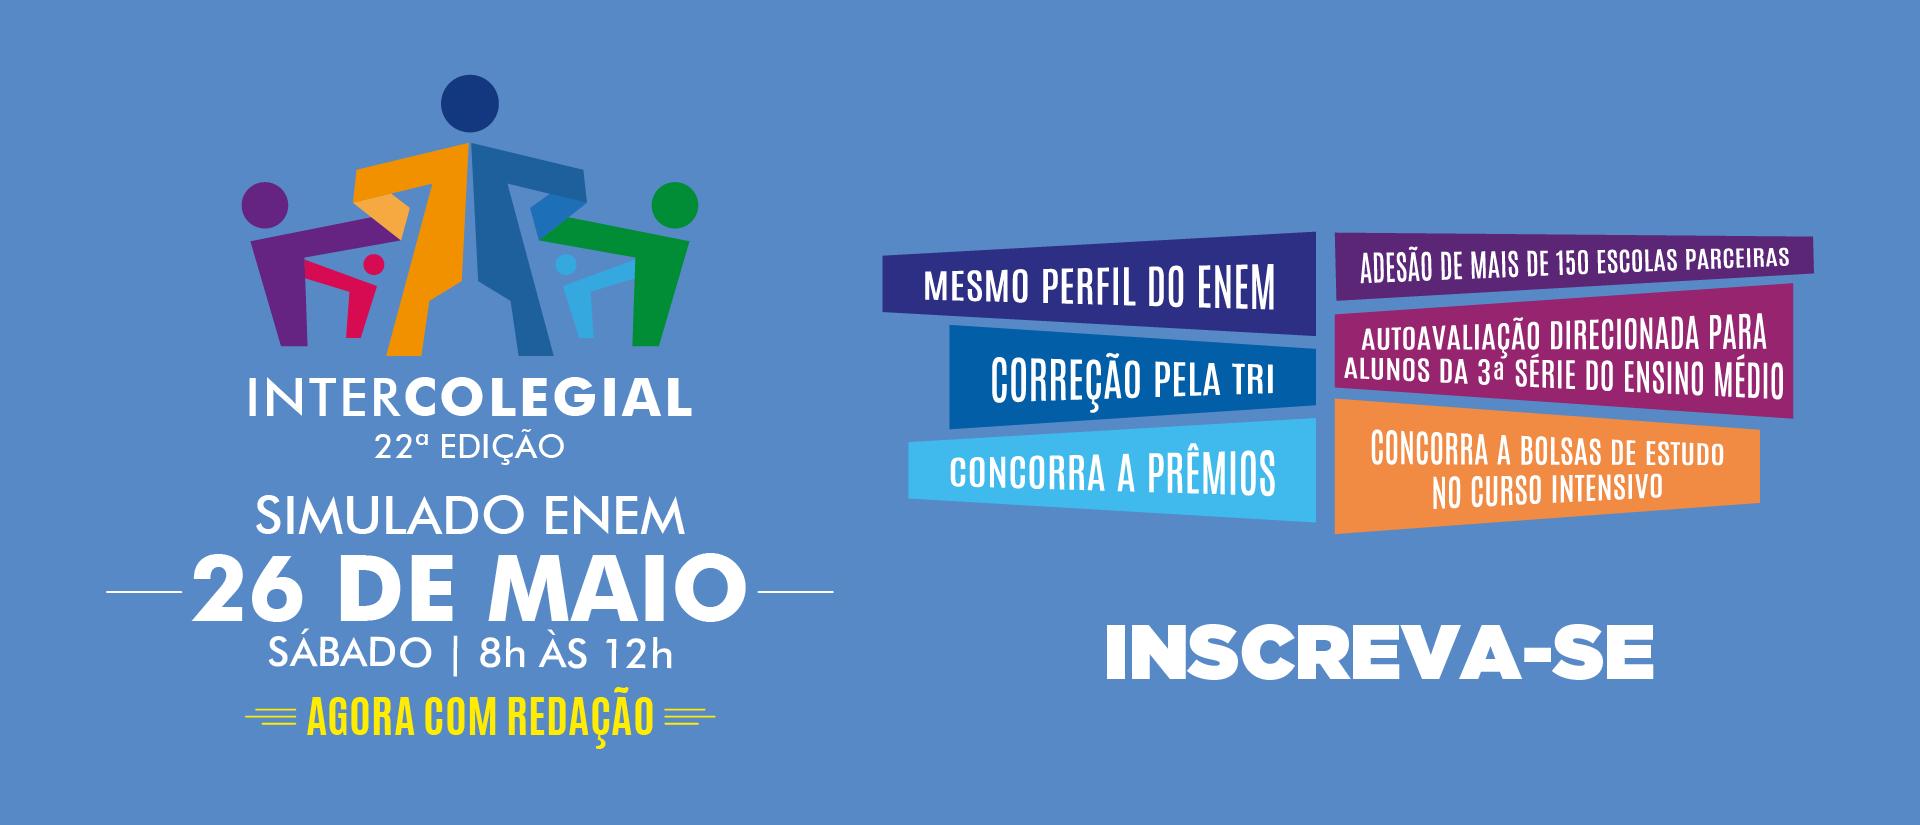 Intercolegial-Chromos-UFMG-2018